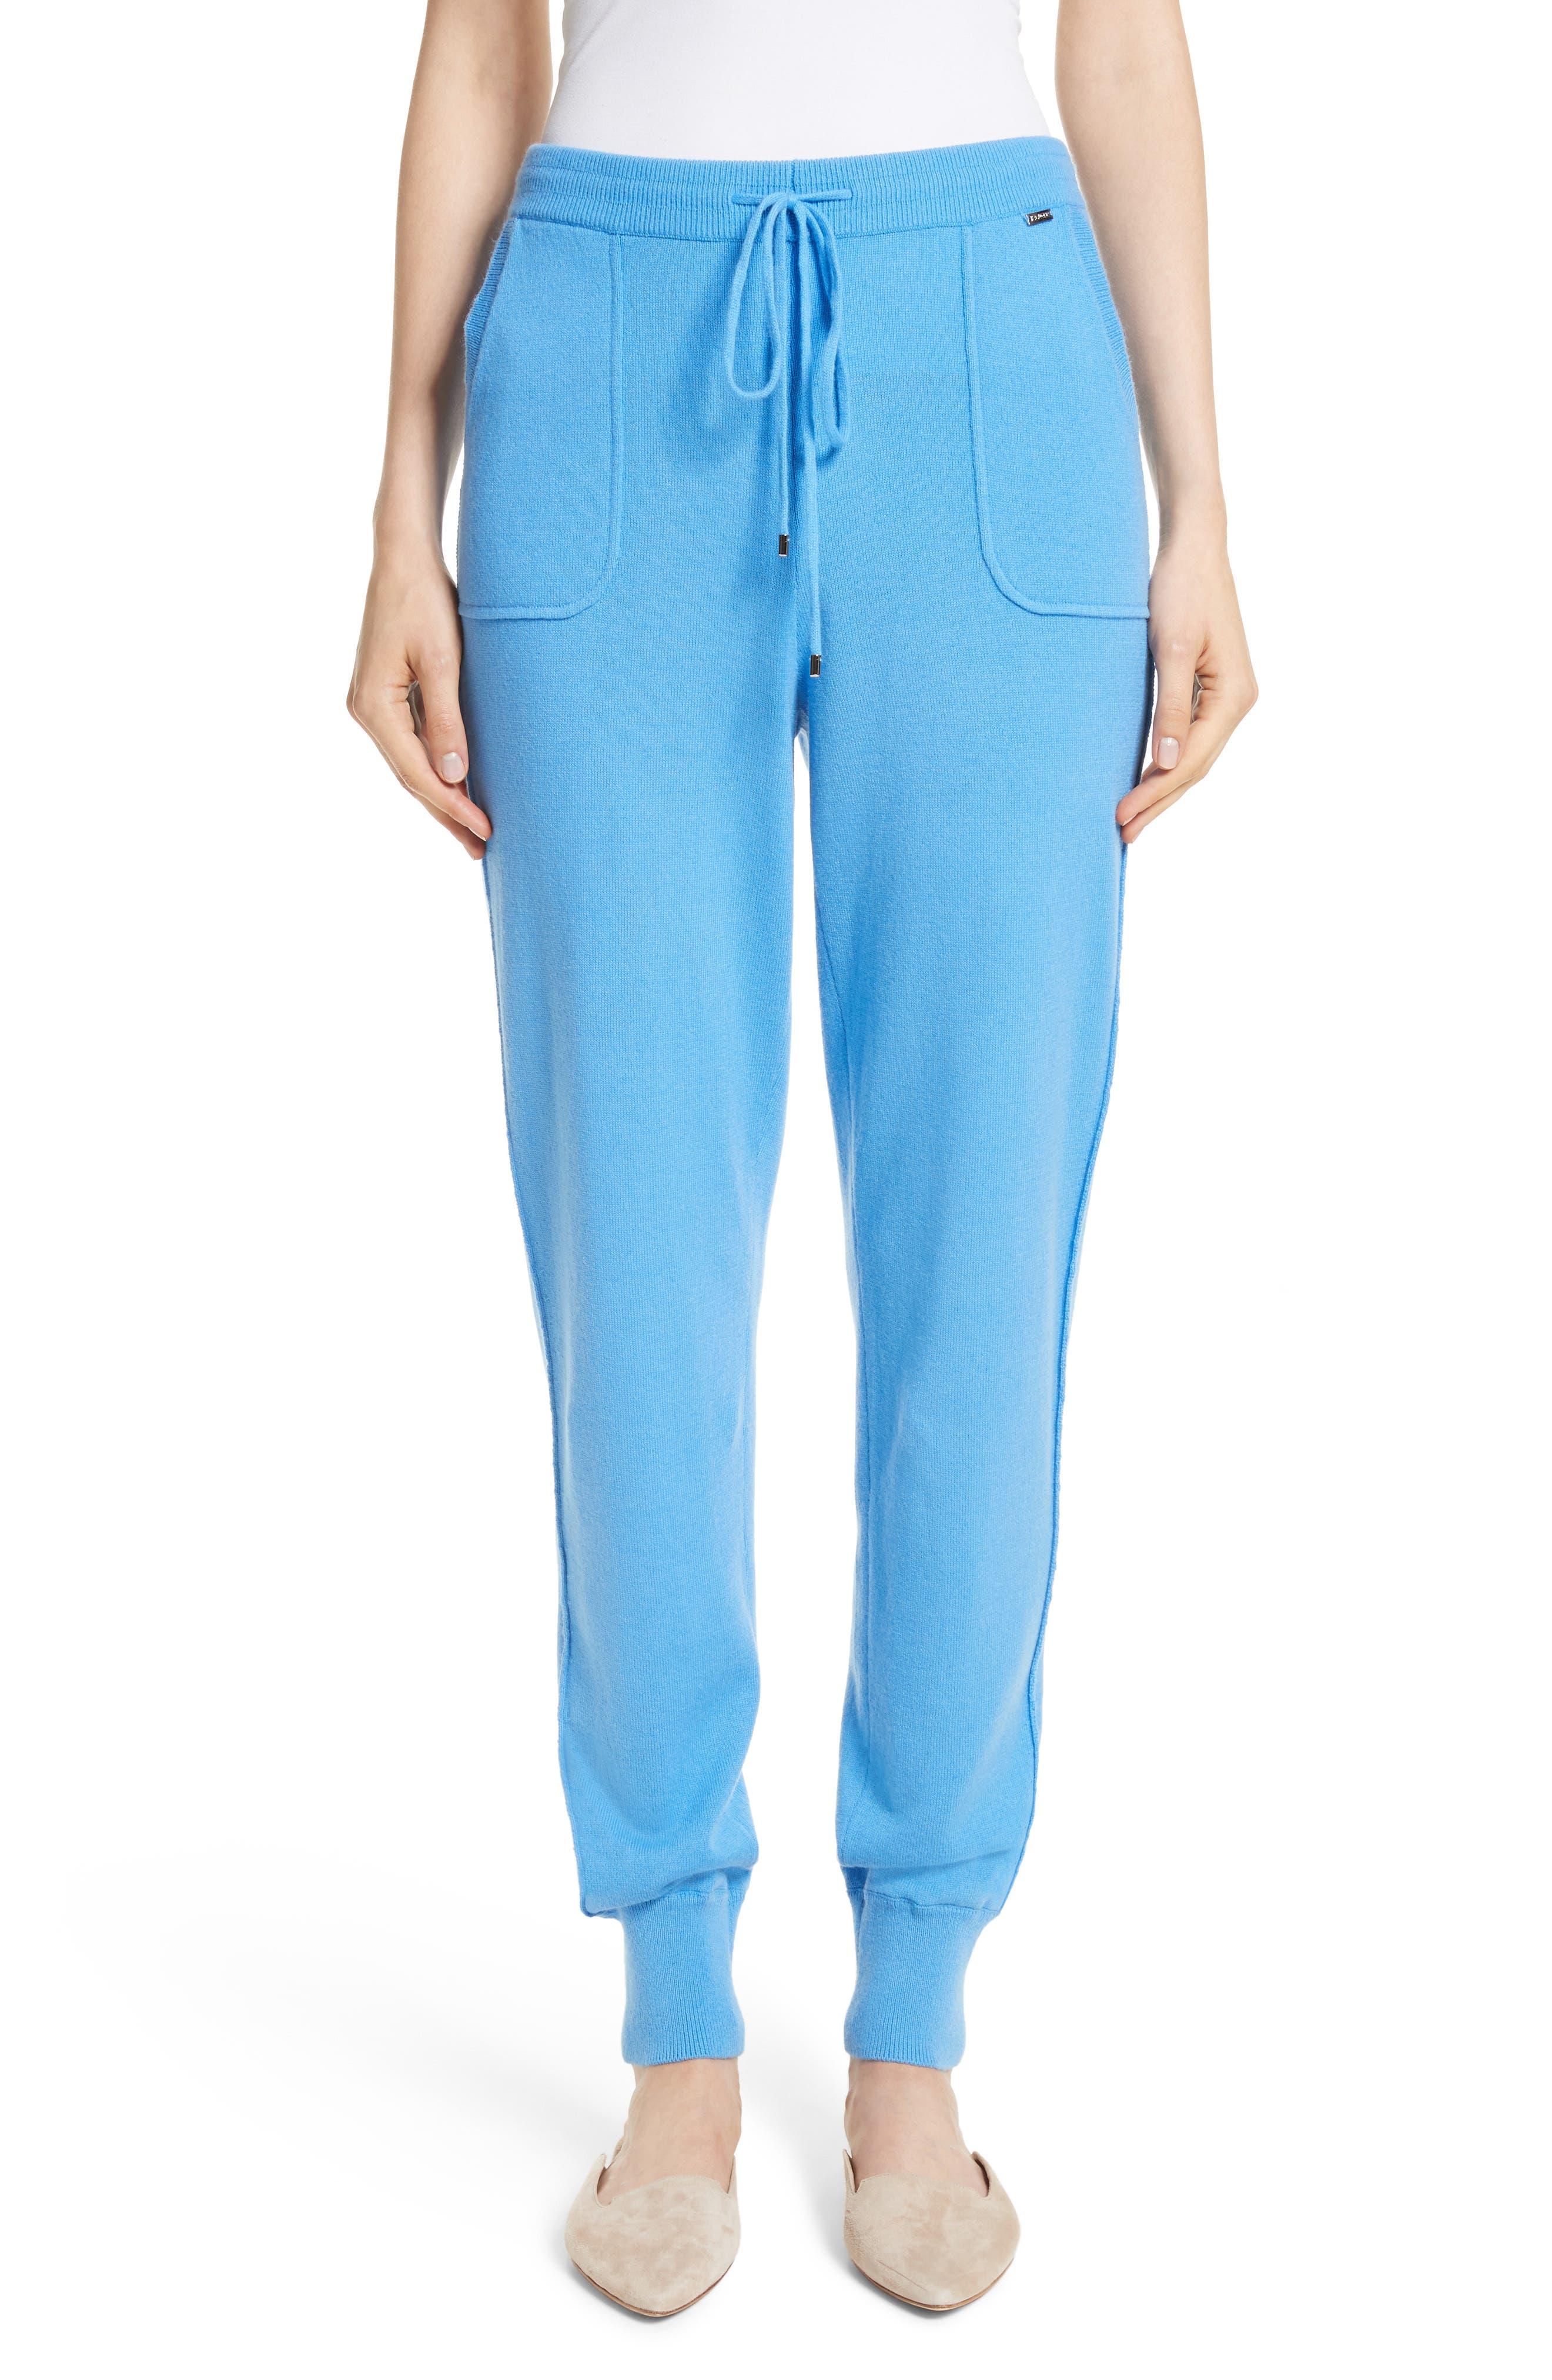 Cashmere Jersey Pants,                             Main thumbnail 1, color,                             Bright Niagara